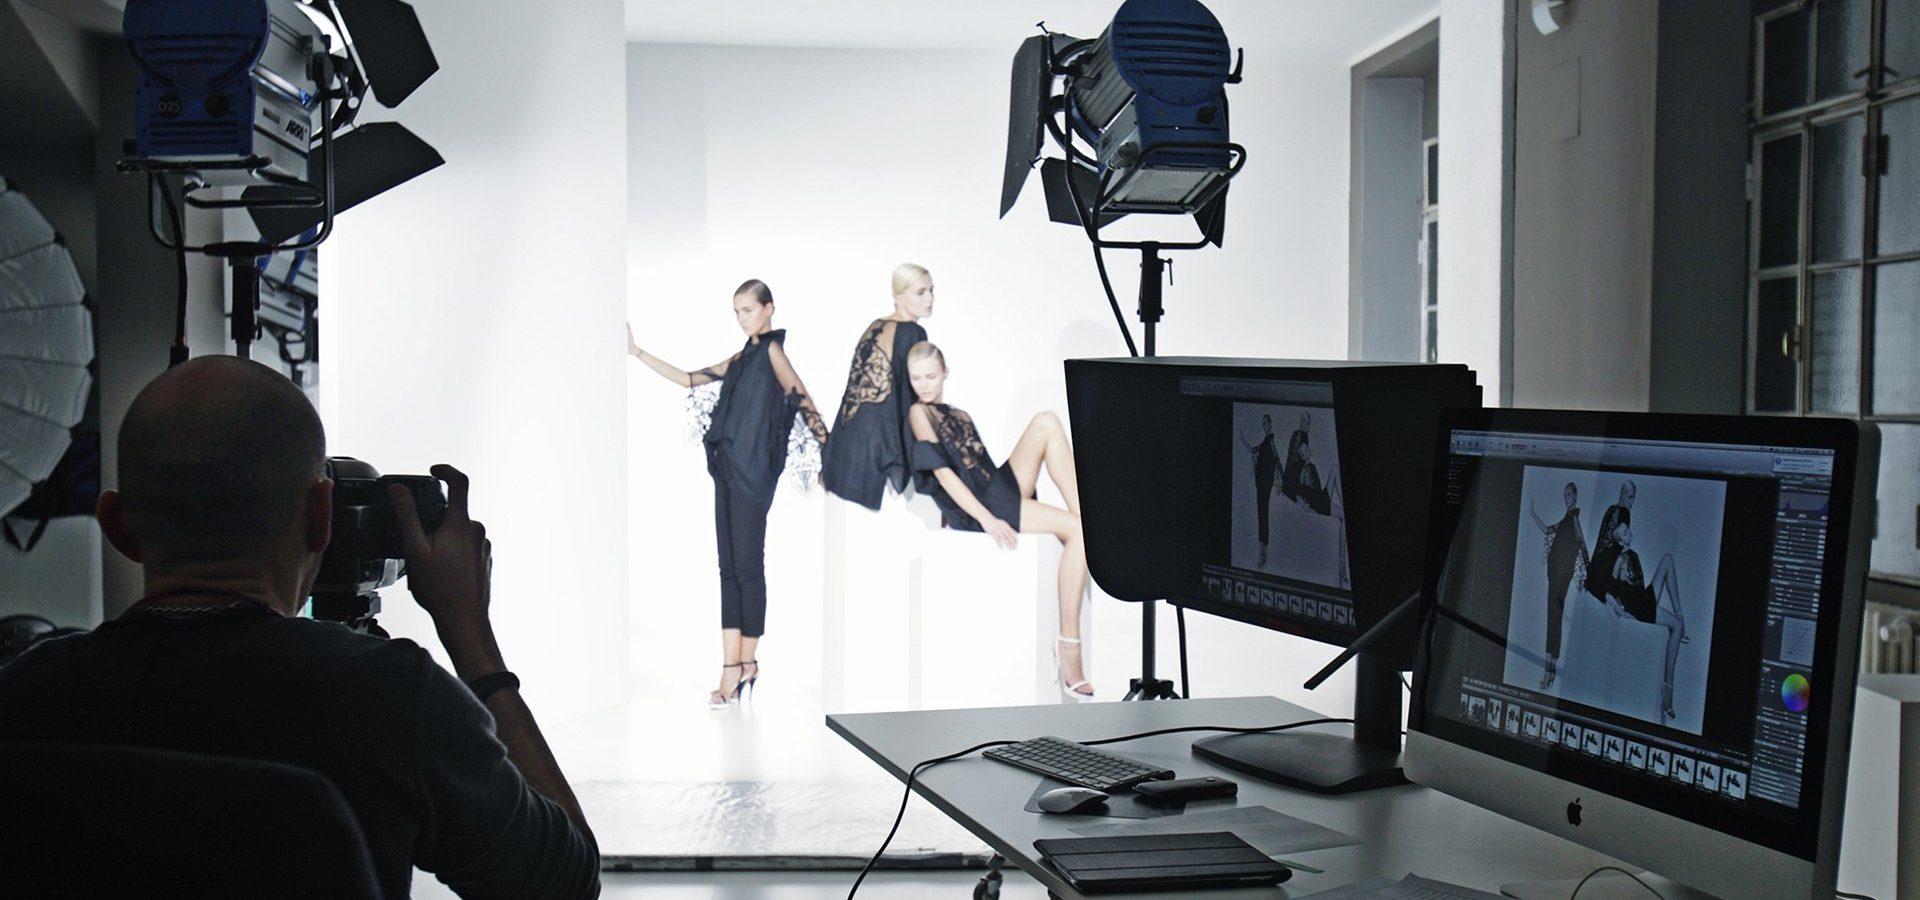 noleggio-studio-fotografico-insight-studio-home3a